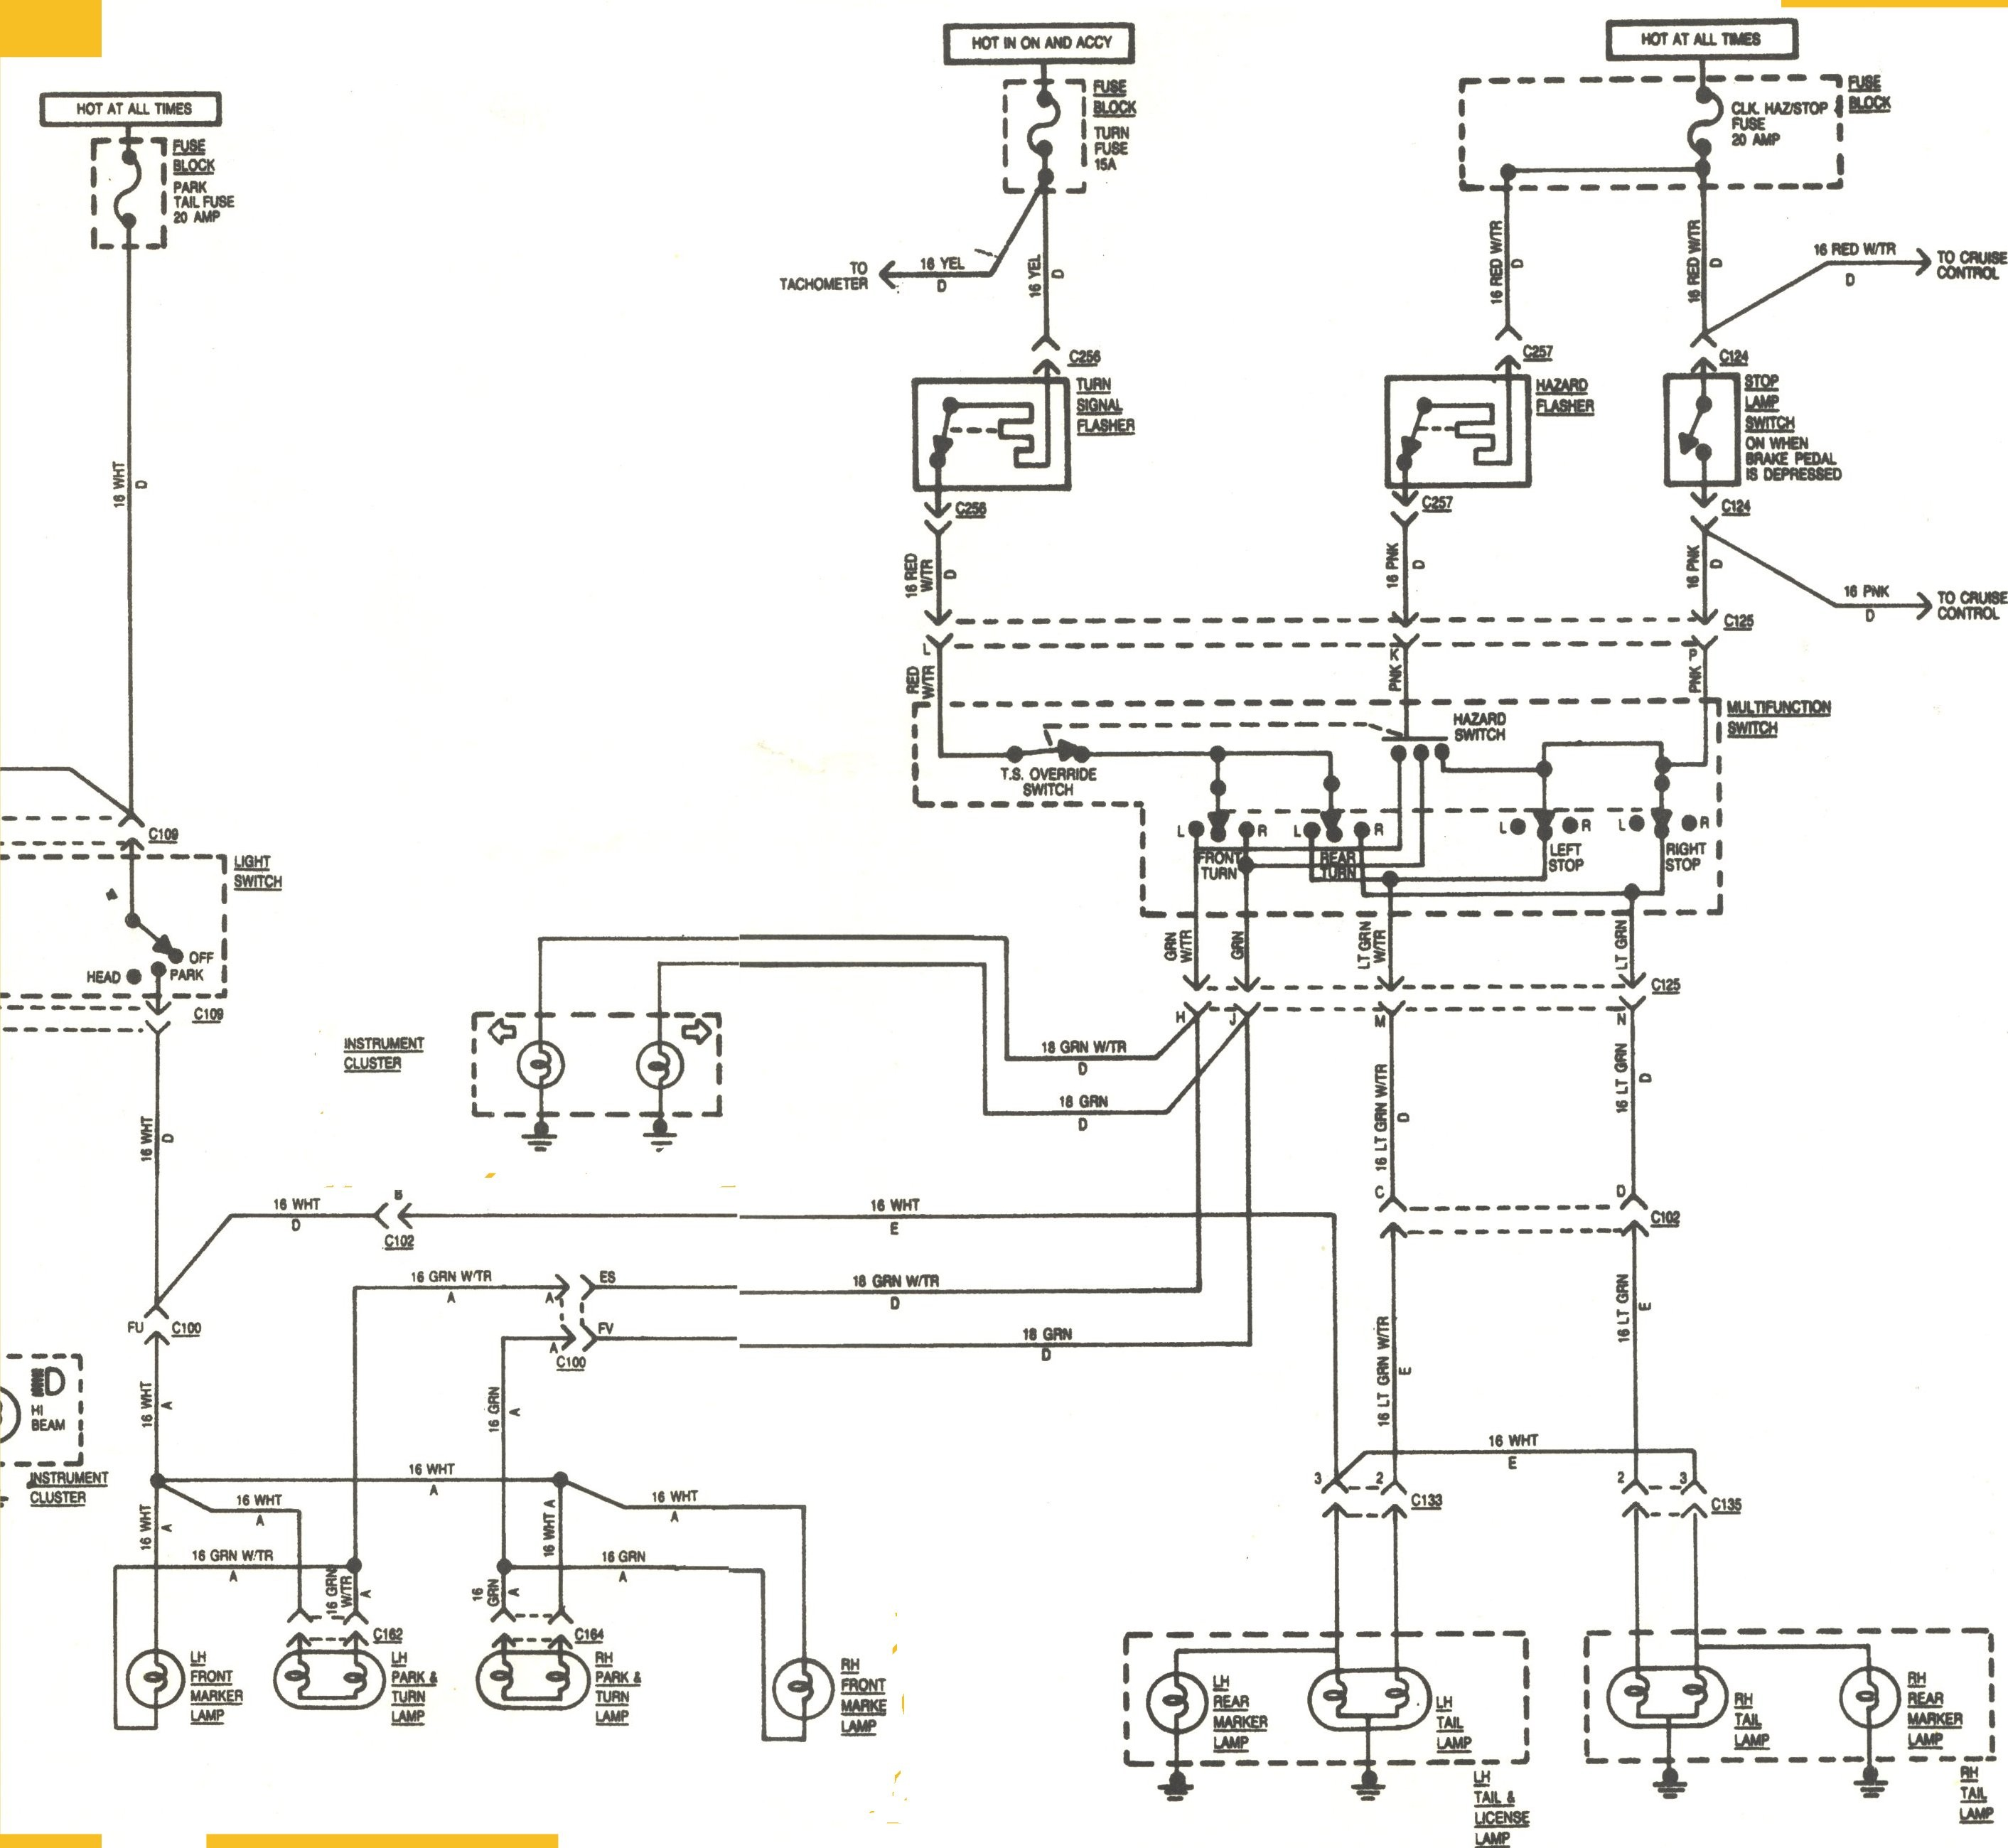 2004 Jeep Liberty Turn Signal Wiring Diagram